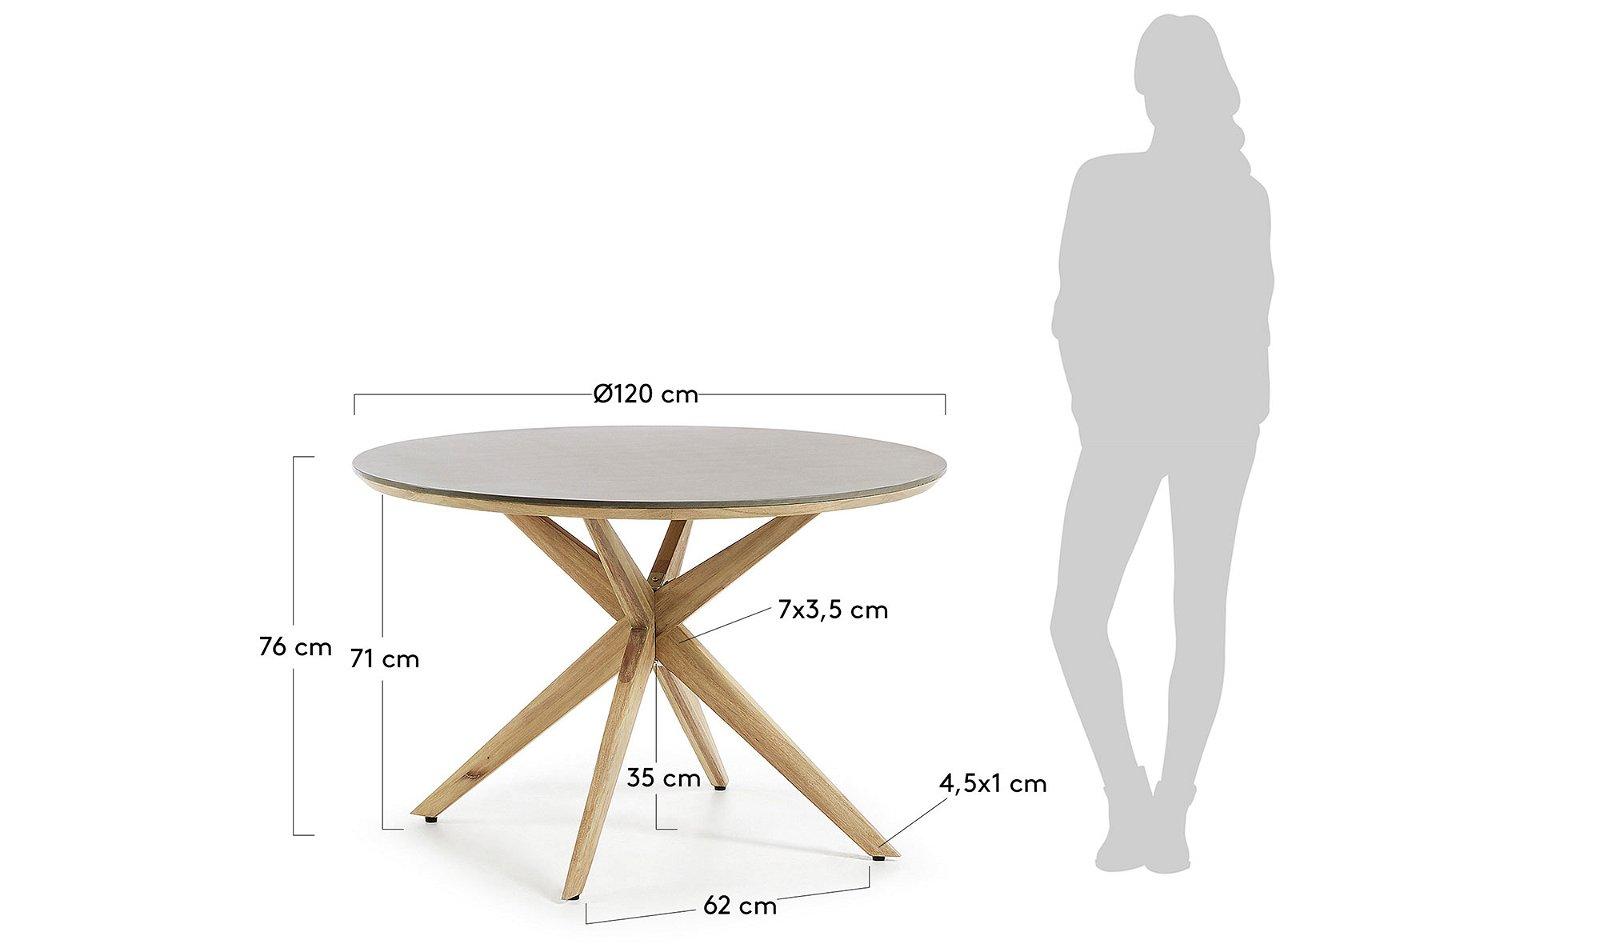 Mesa de comedor redonda cemento Juliette